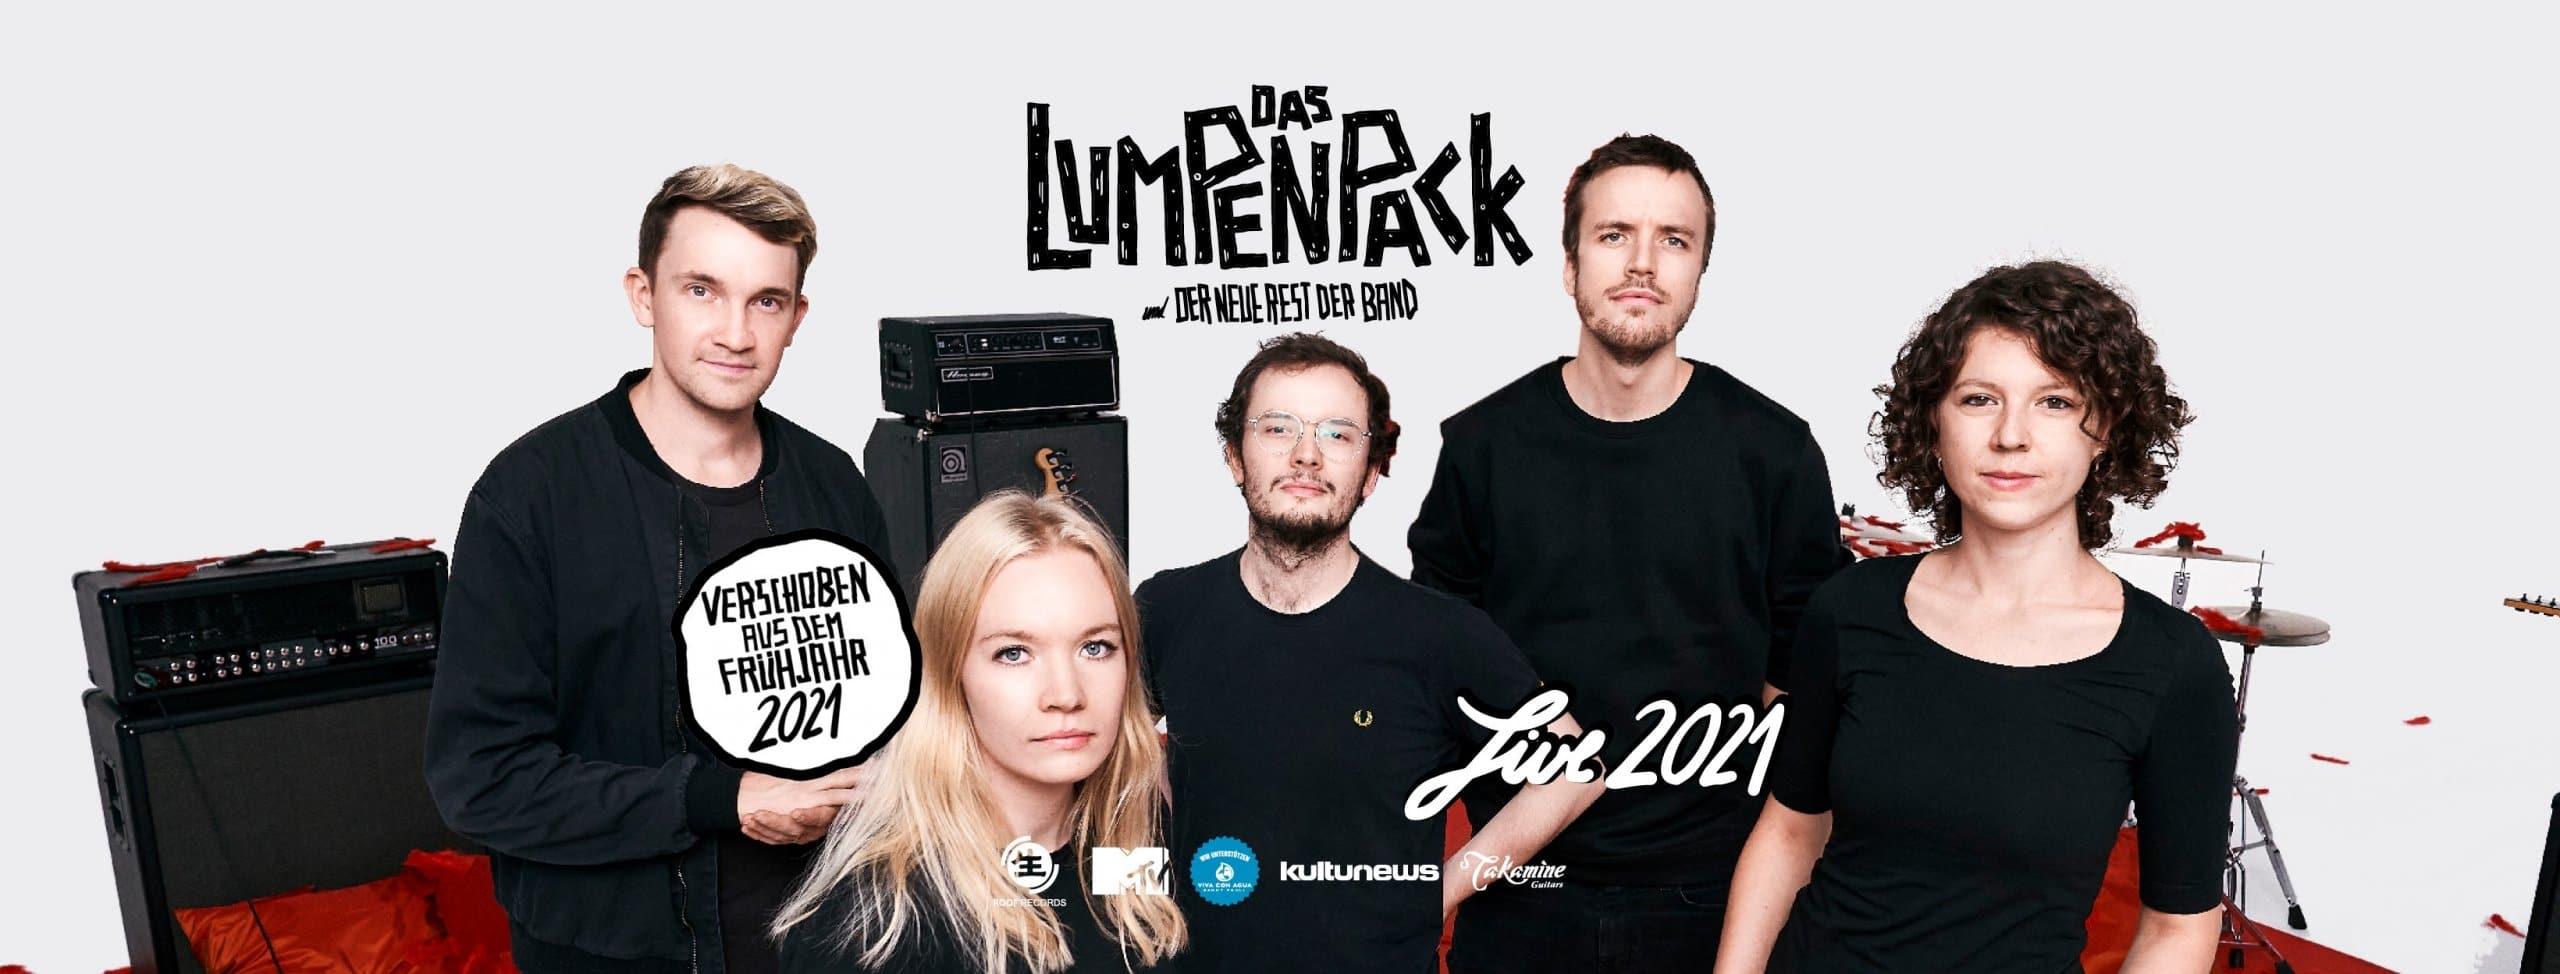 Events Wien: Das Lumpenpack • AT- Wien • Neuer Termin! 09.09.'21!